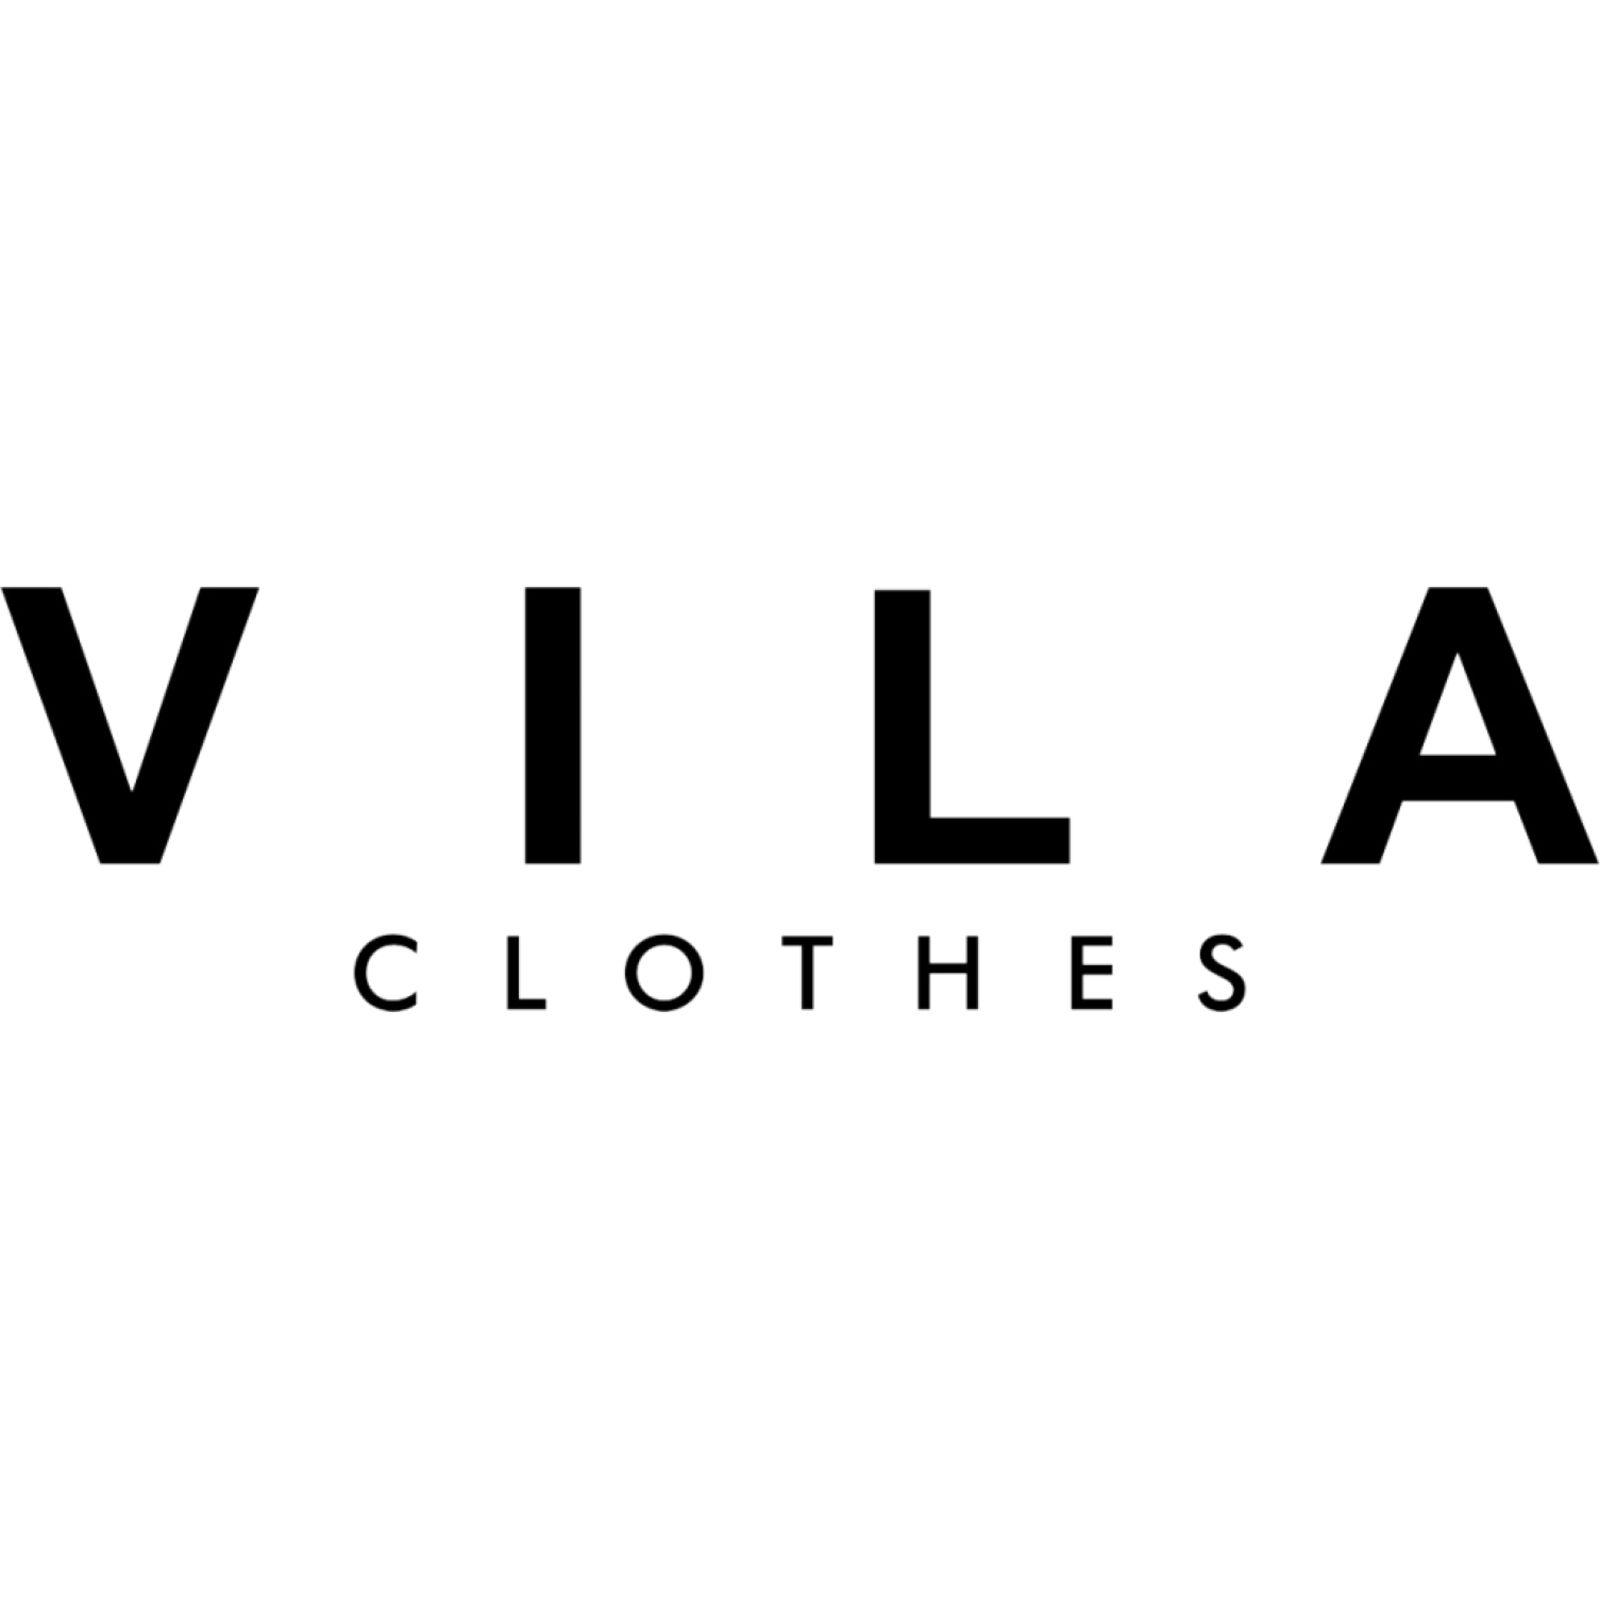 VILA (Image 1)